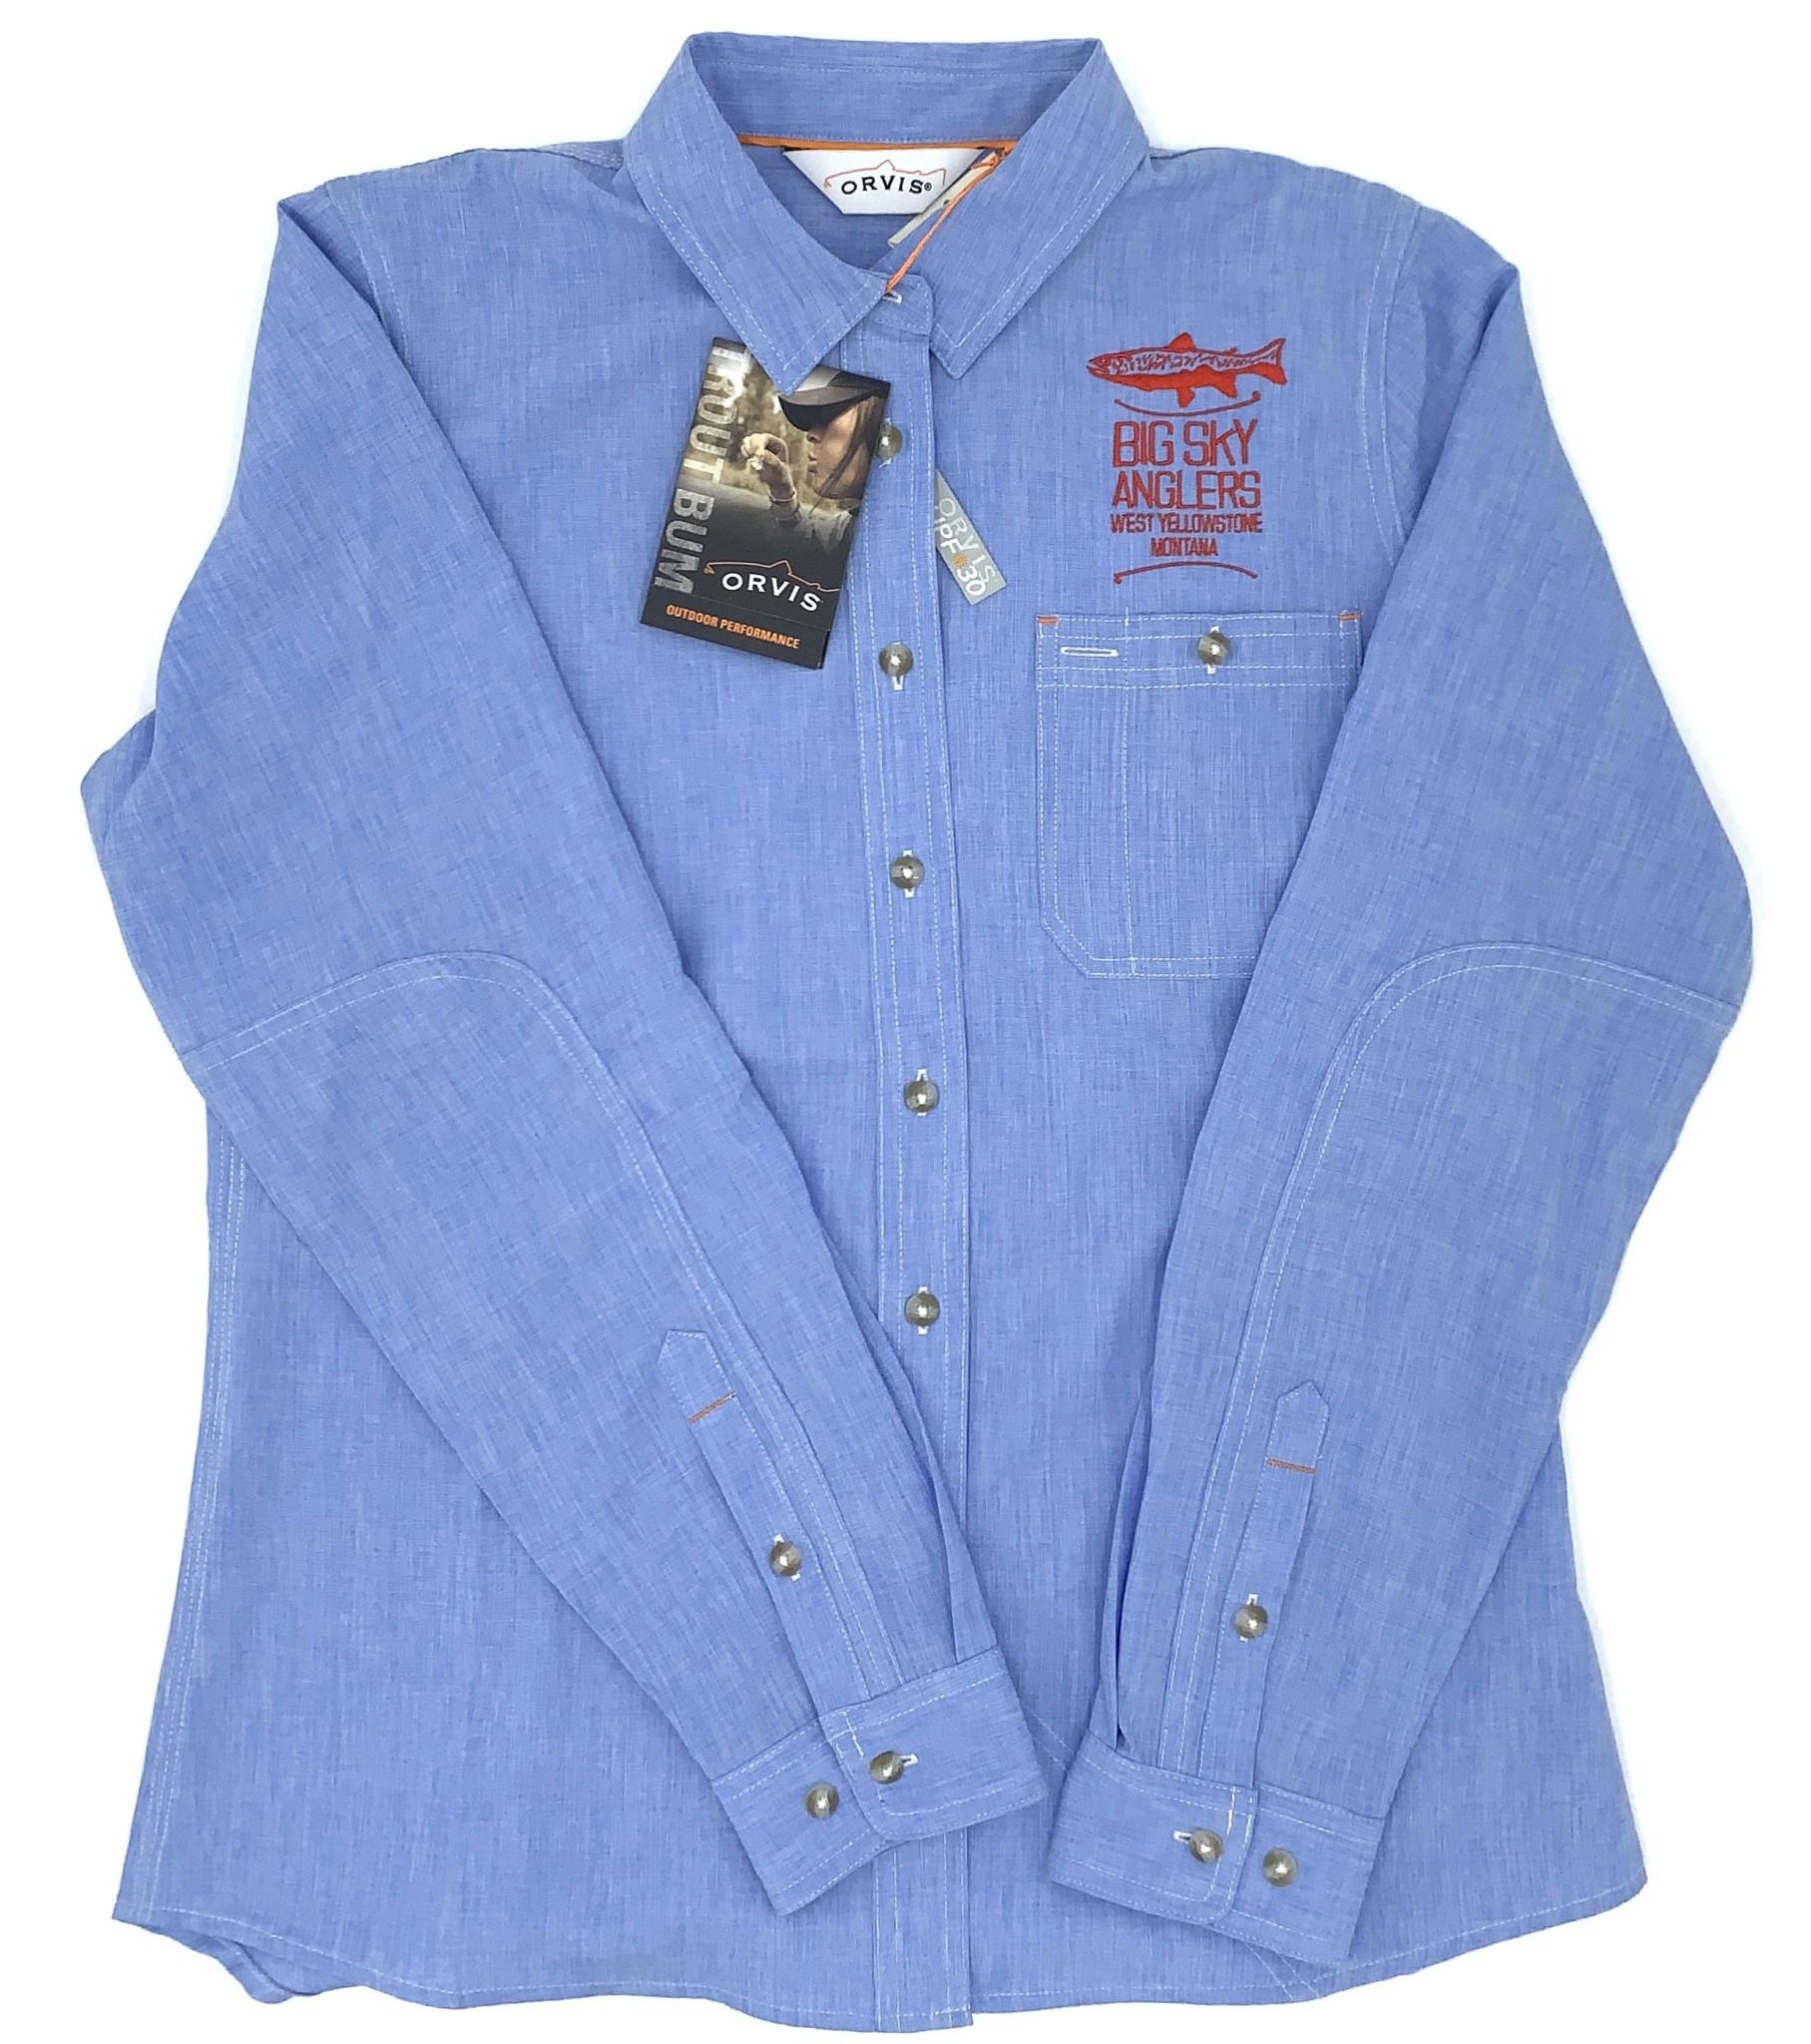 Big Sky Anglers BSA Stack Orvis Women's Tech Chambray Work Shirt